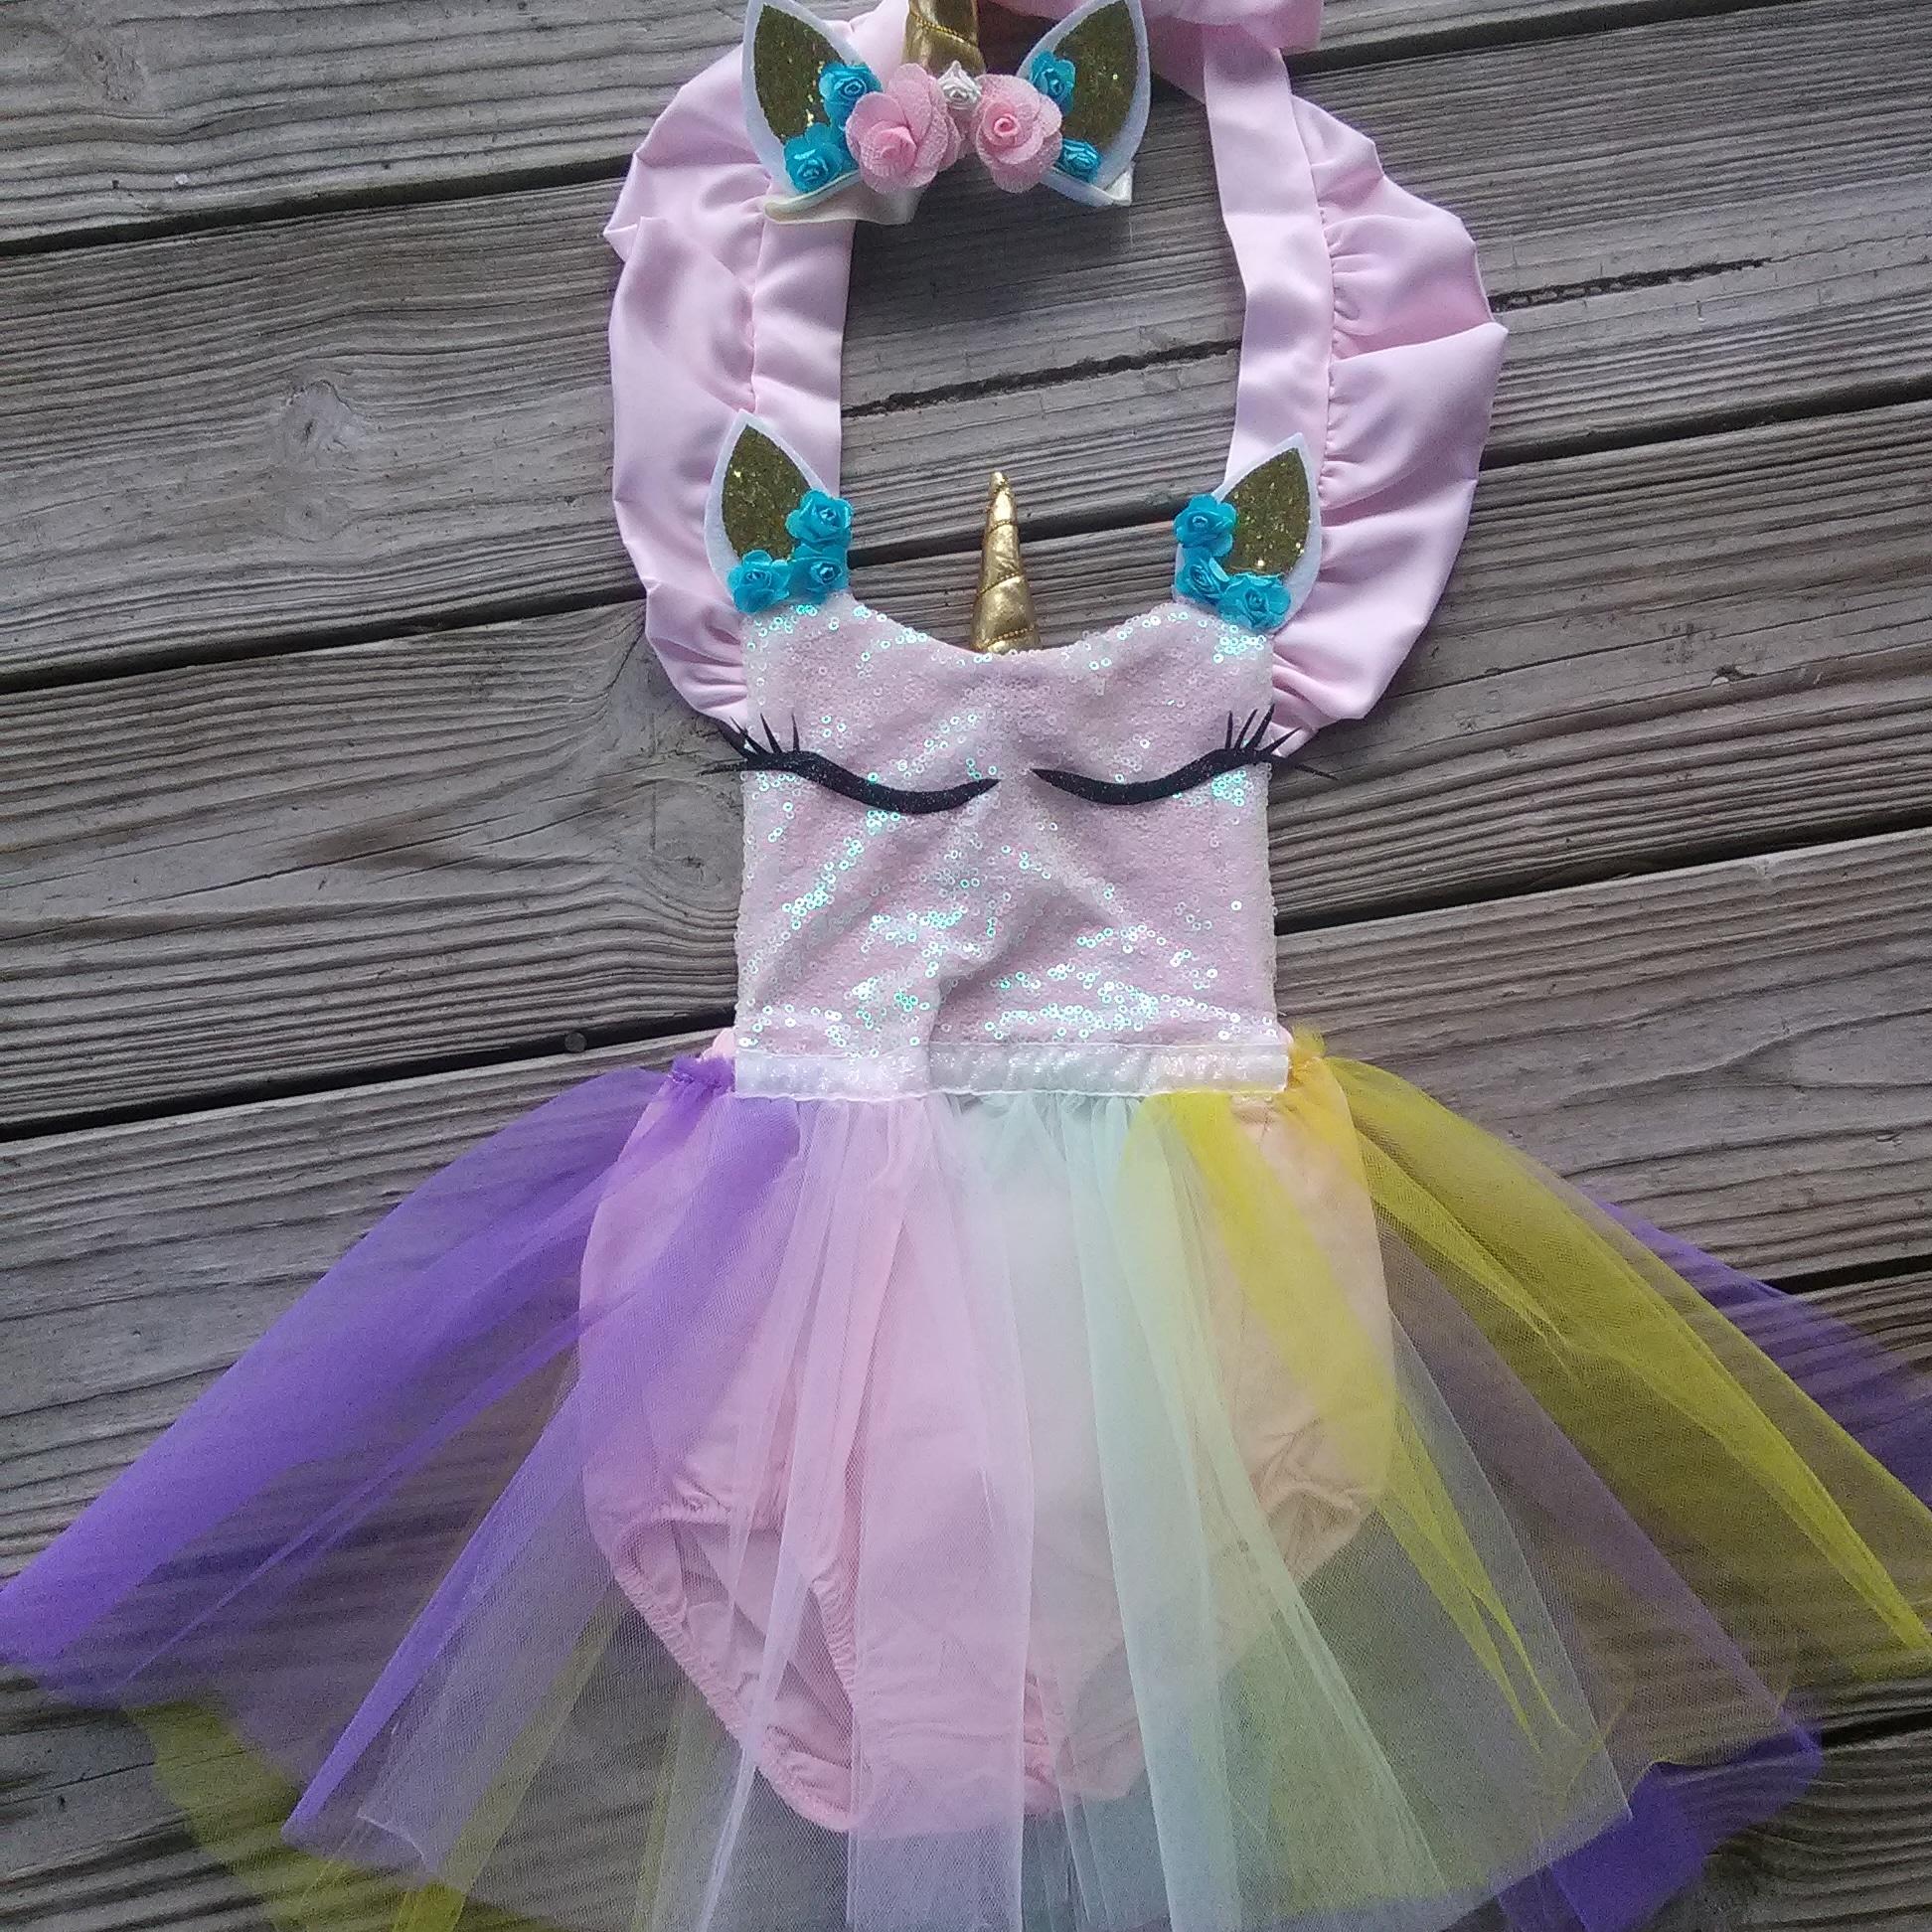 87b6b5bcf unicorn romper,unicorn tutu baby outfit,unicorn birthday,unicorn first  birthday,unicorn